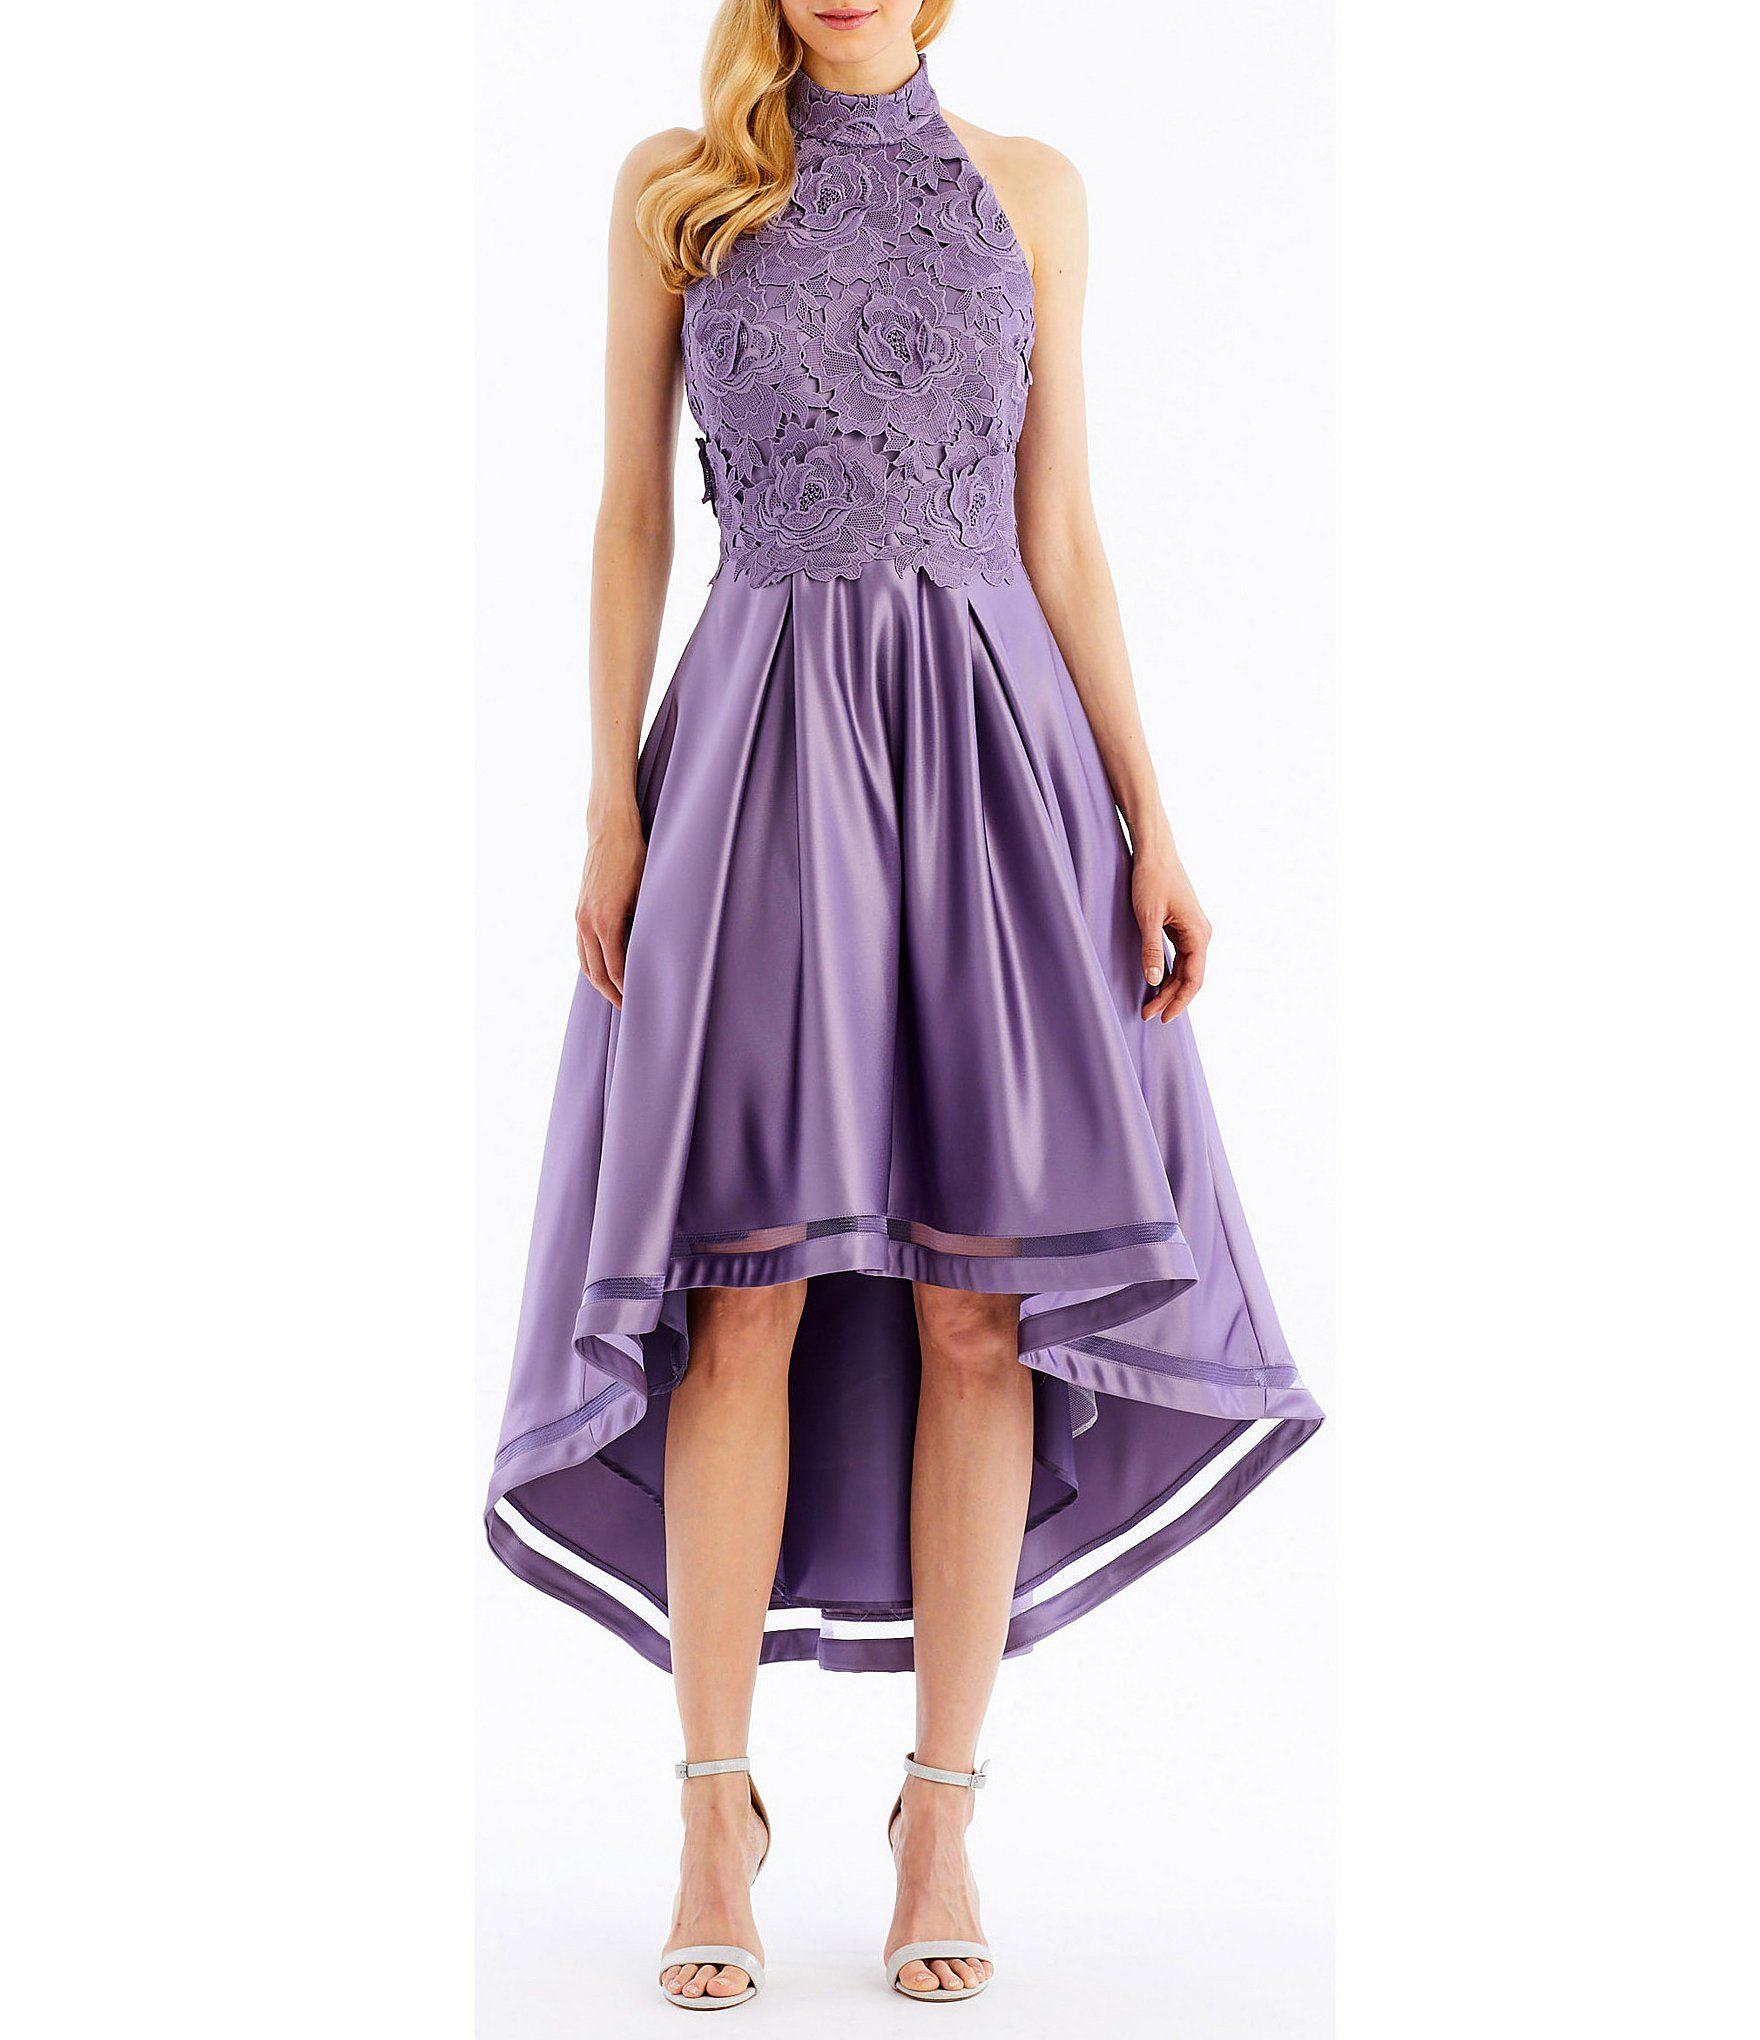 Hermosa Black Cocktail Dresses Dillards Componente - Vestido de ...